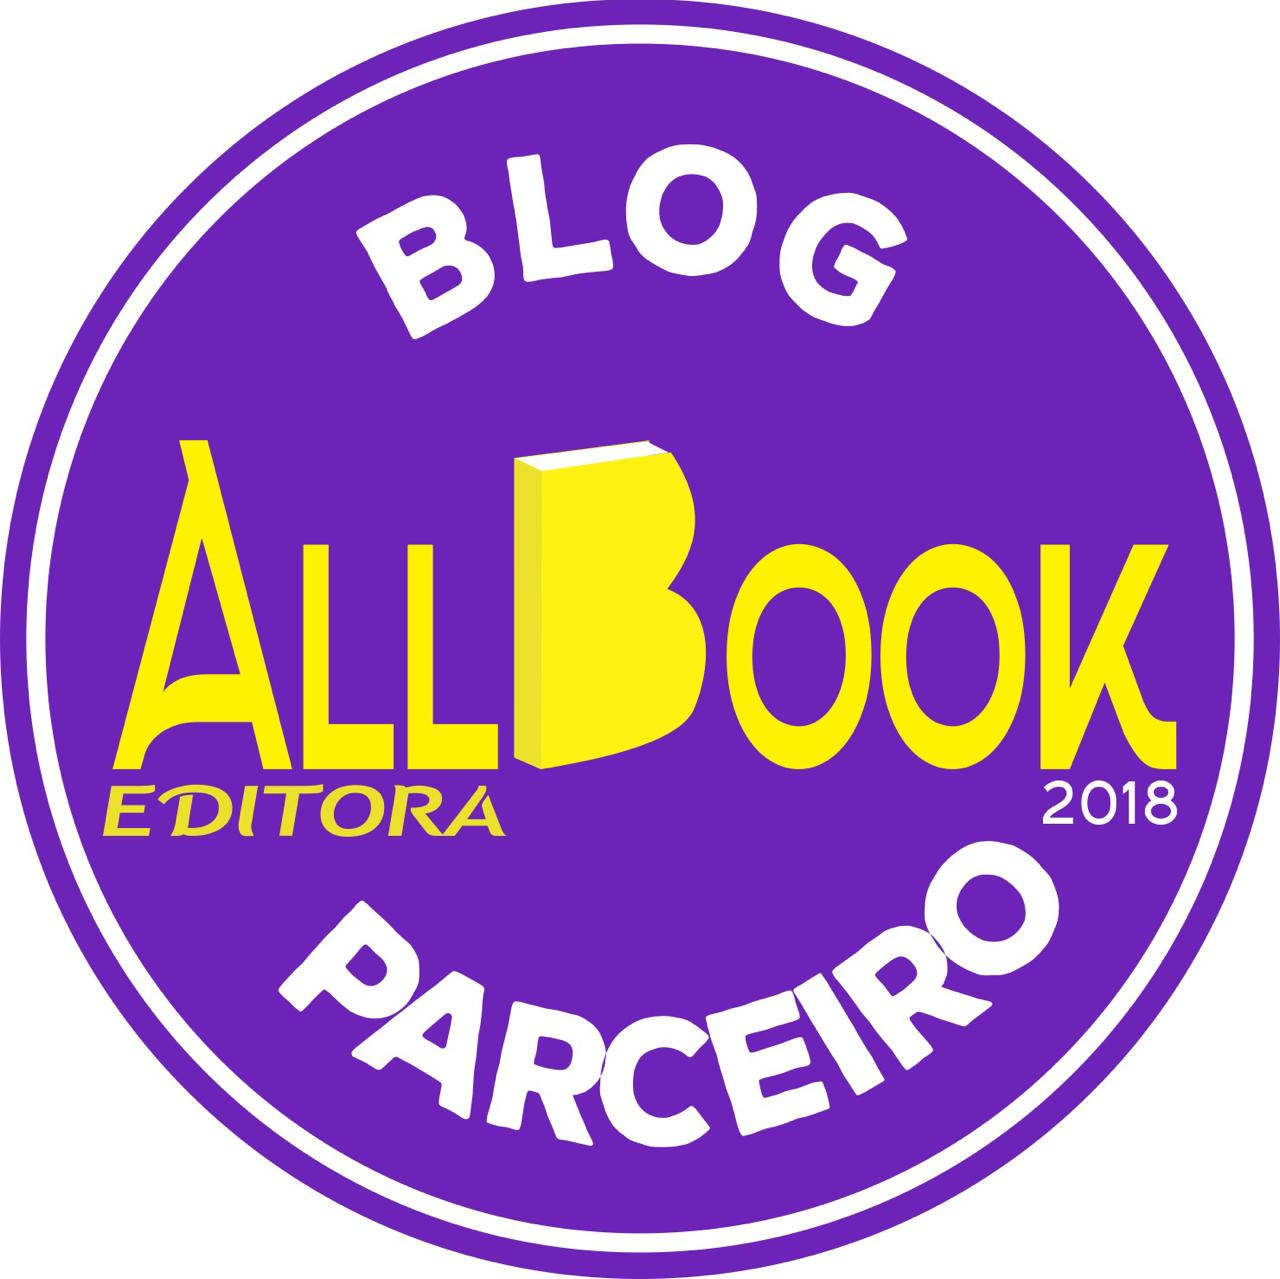 All Book